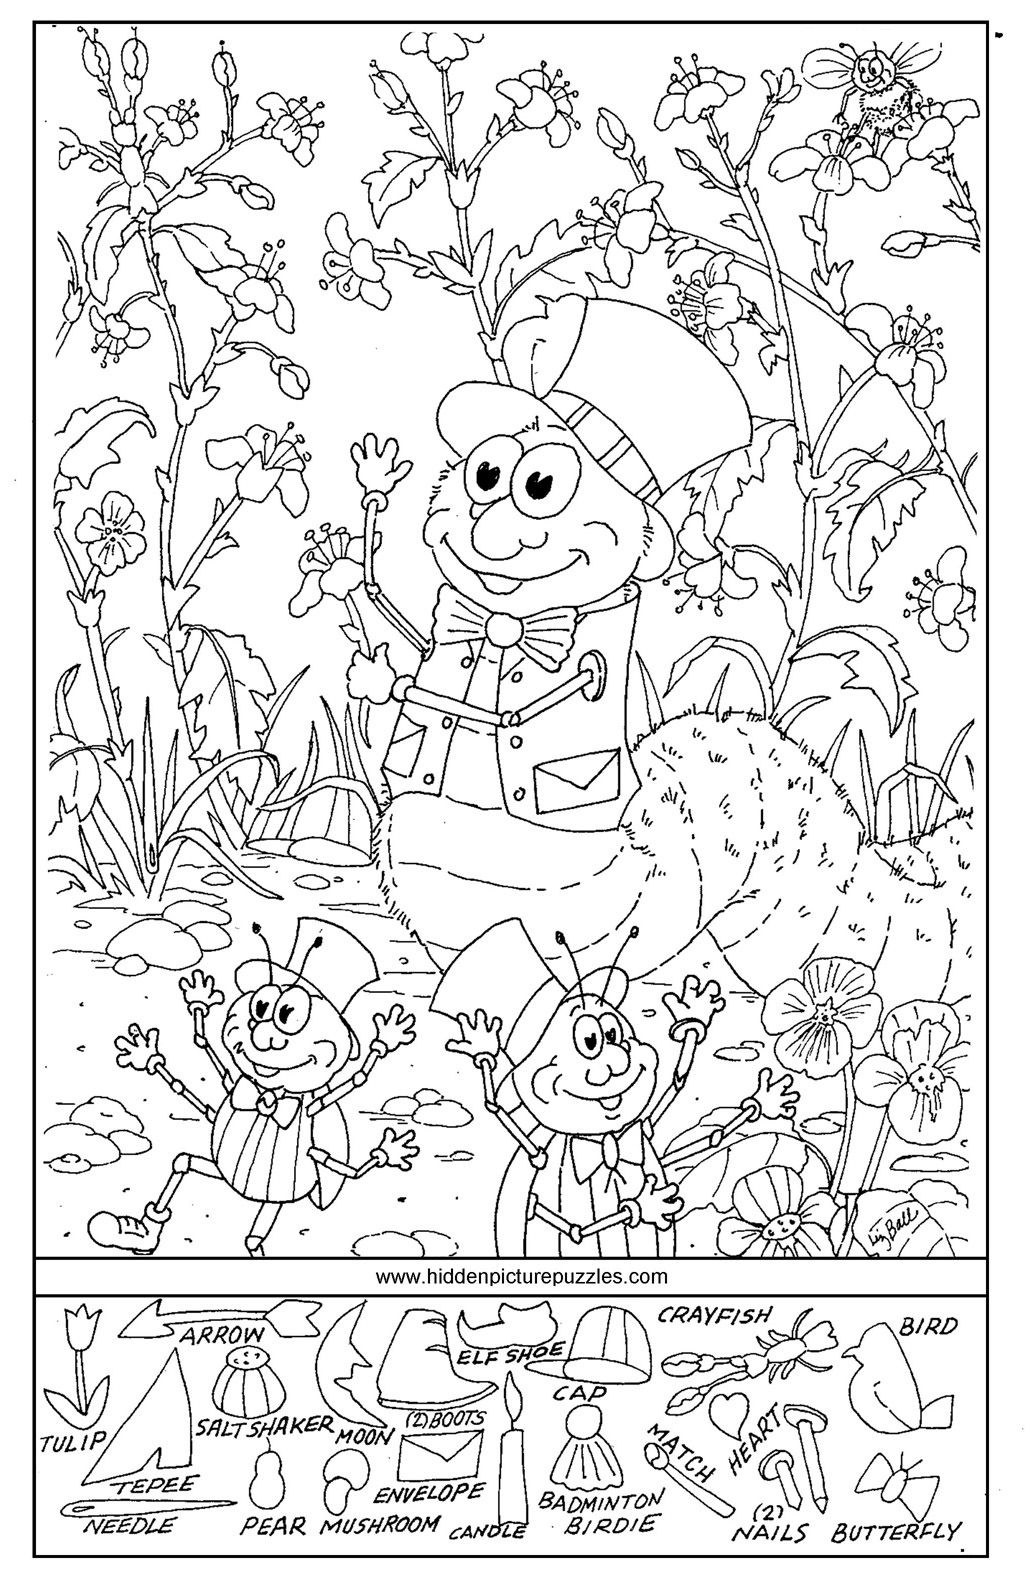 Hidden Pictures Page - Print Your Free Hidden Pictures Page At - Free Printable Hidden Pictures For Kids